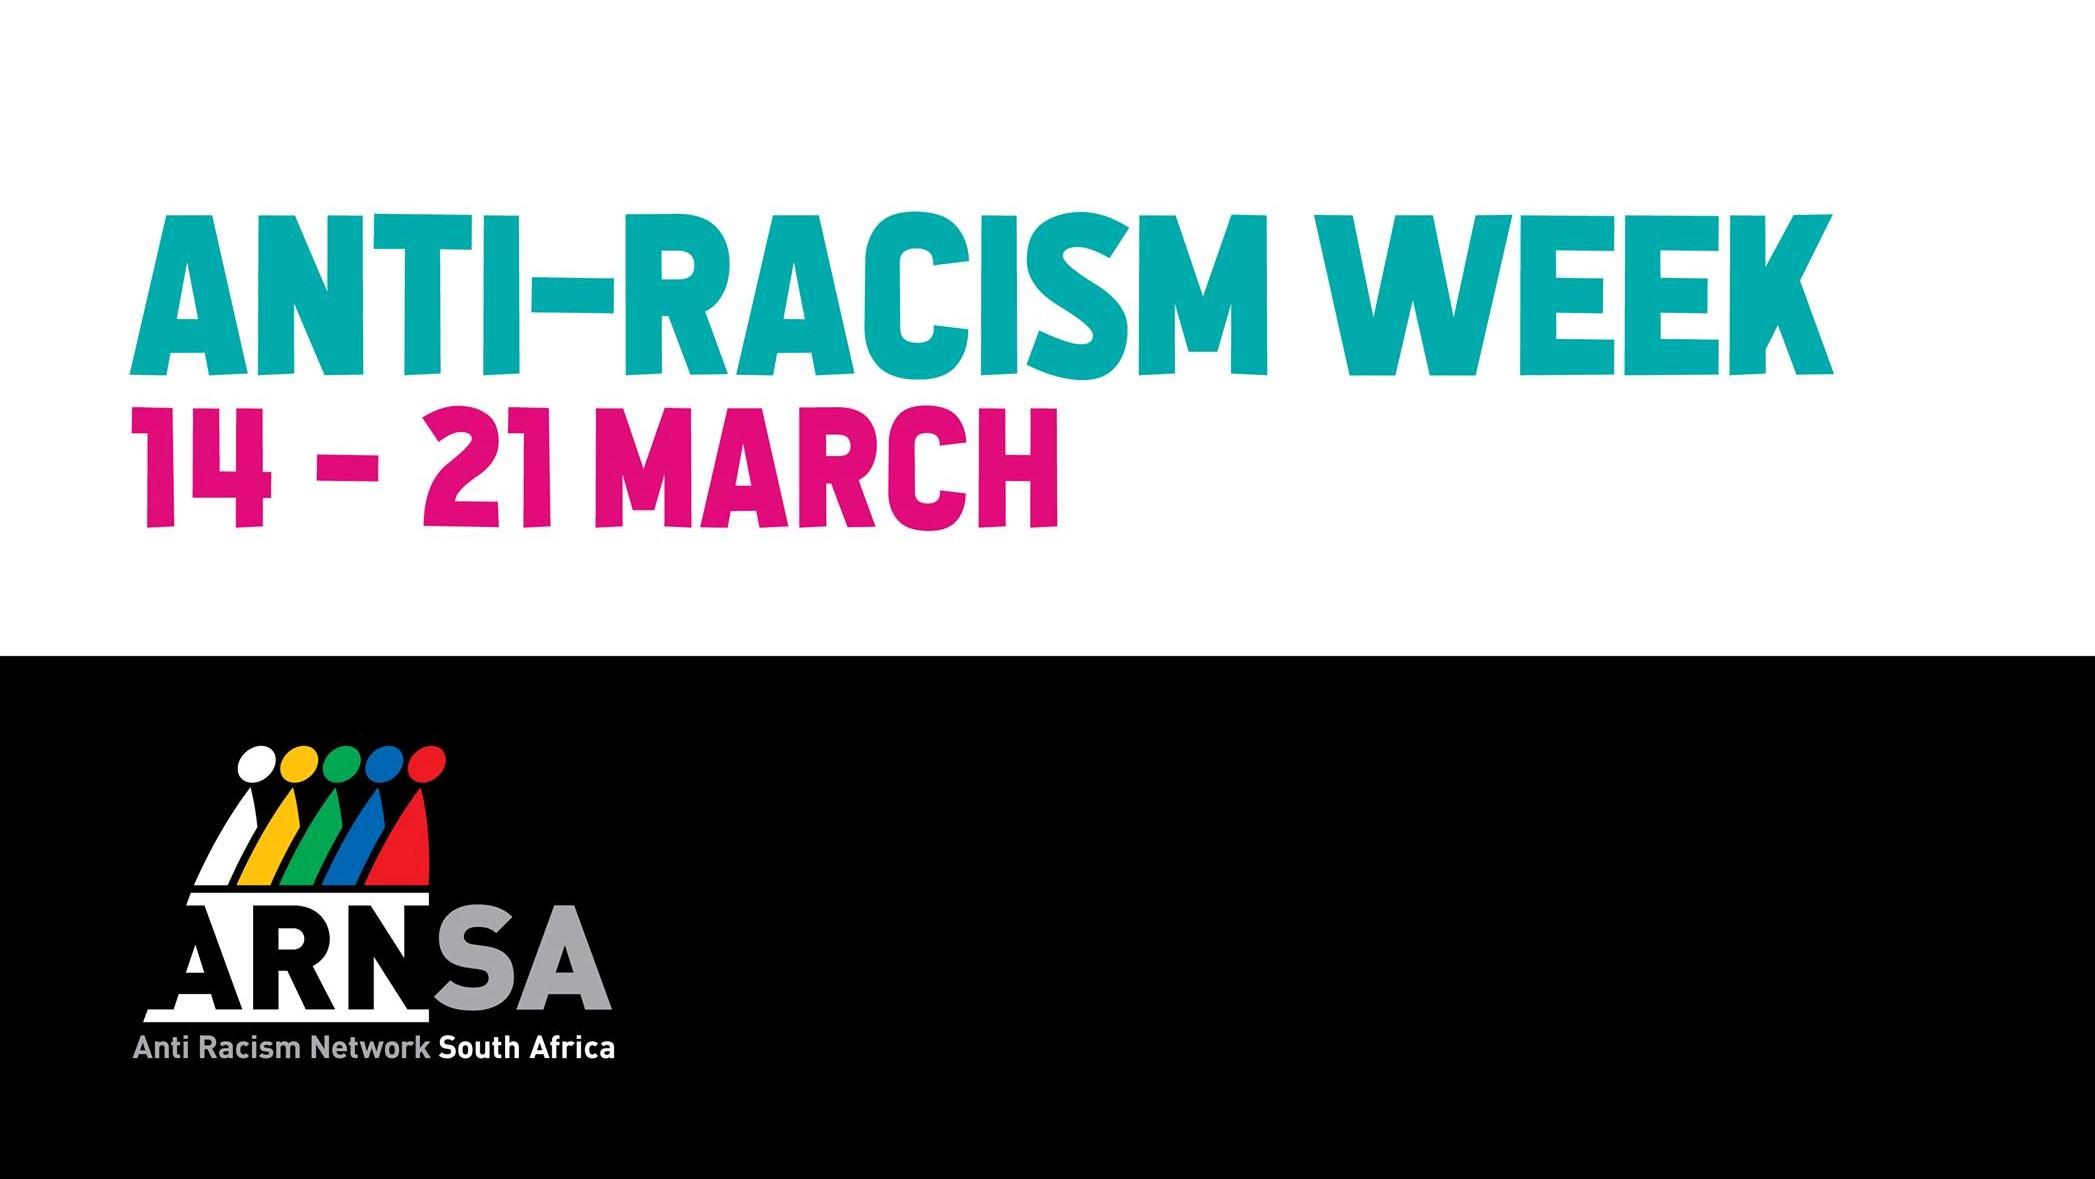 Anti - Racism Week 14 - 21 March 2019